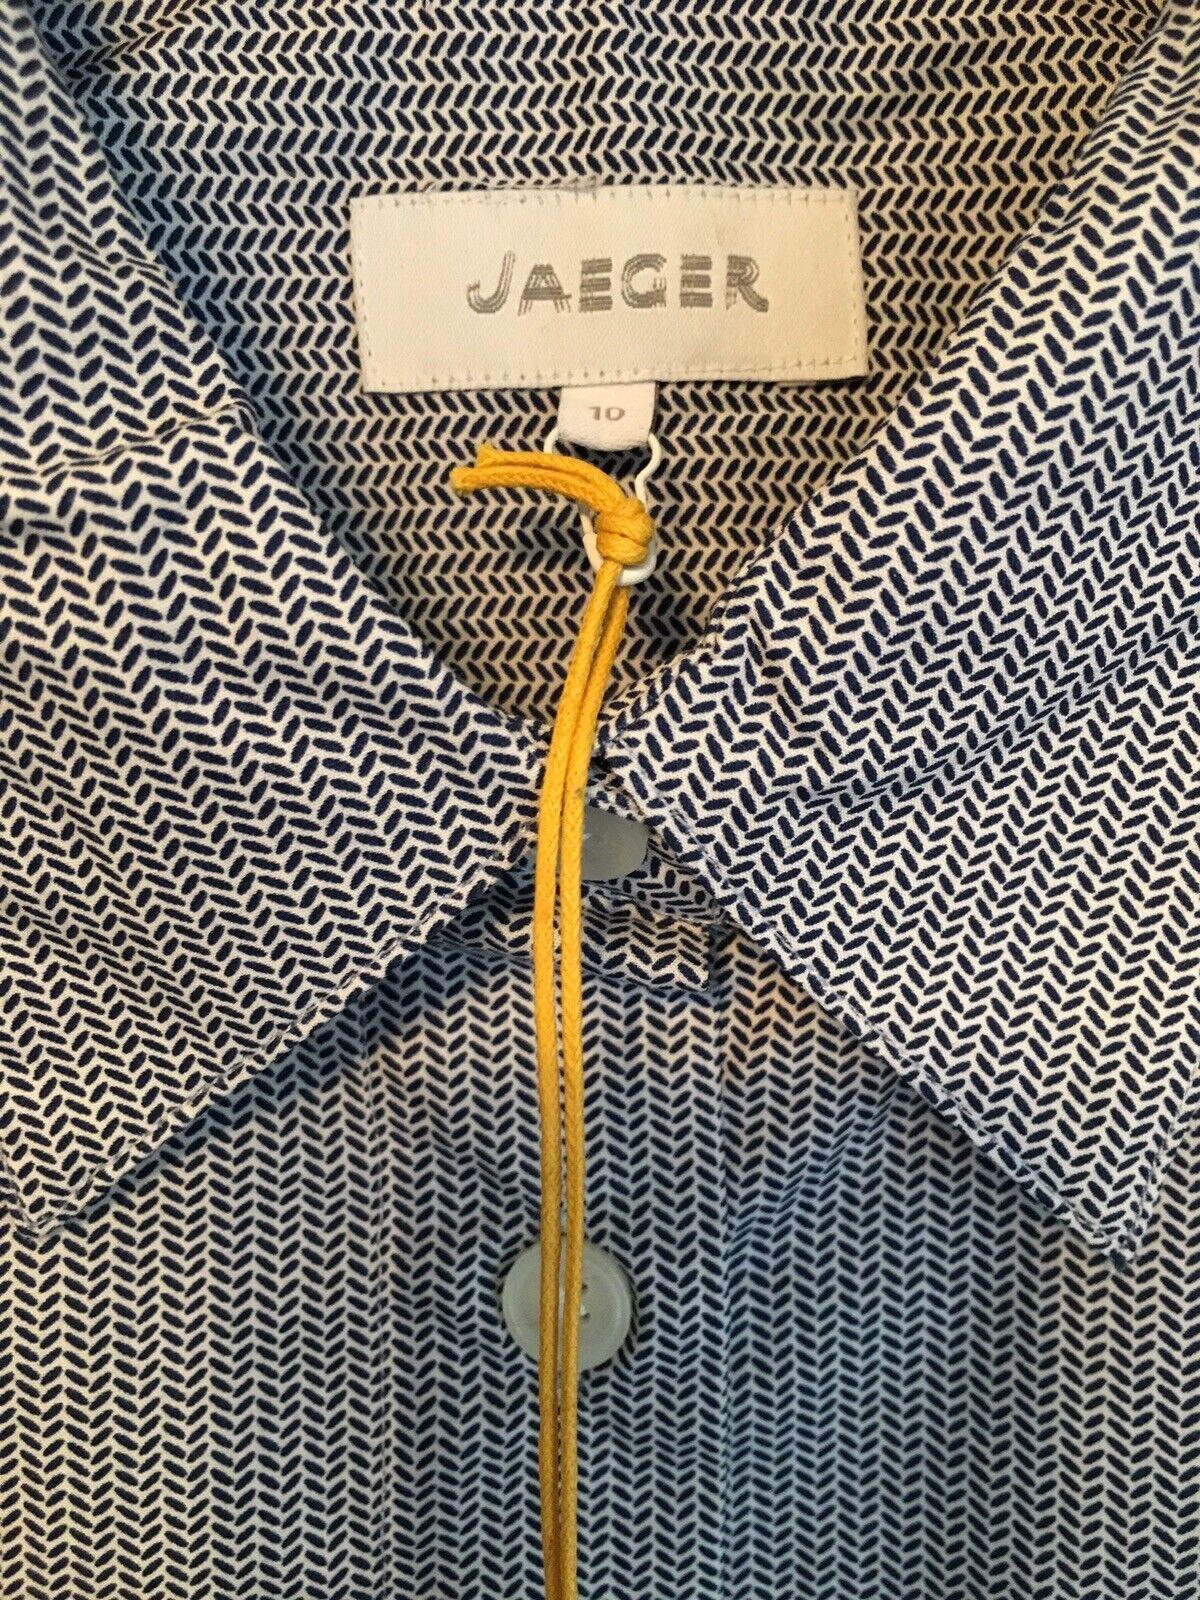 Jaeger damen Long Sleeve Fitted Cotton Shirt Multicolour Größe 10 RRP BNWT